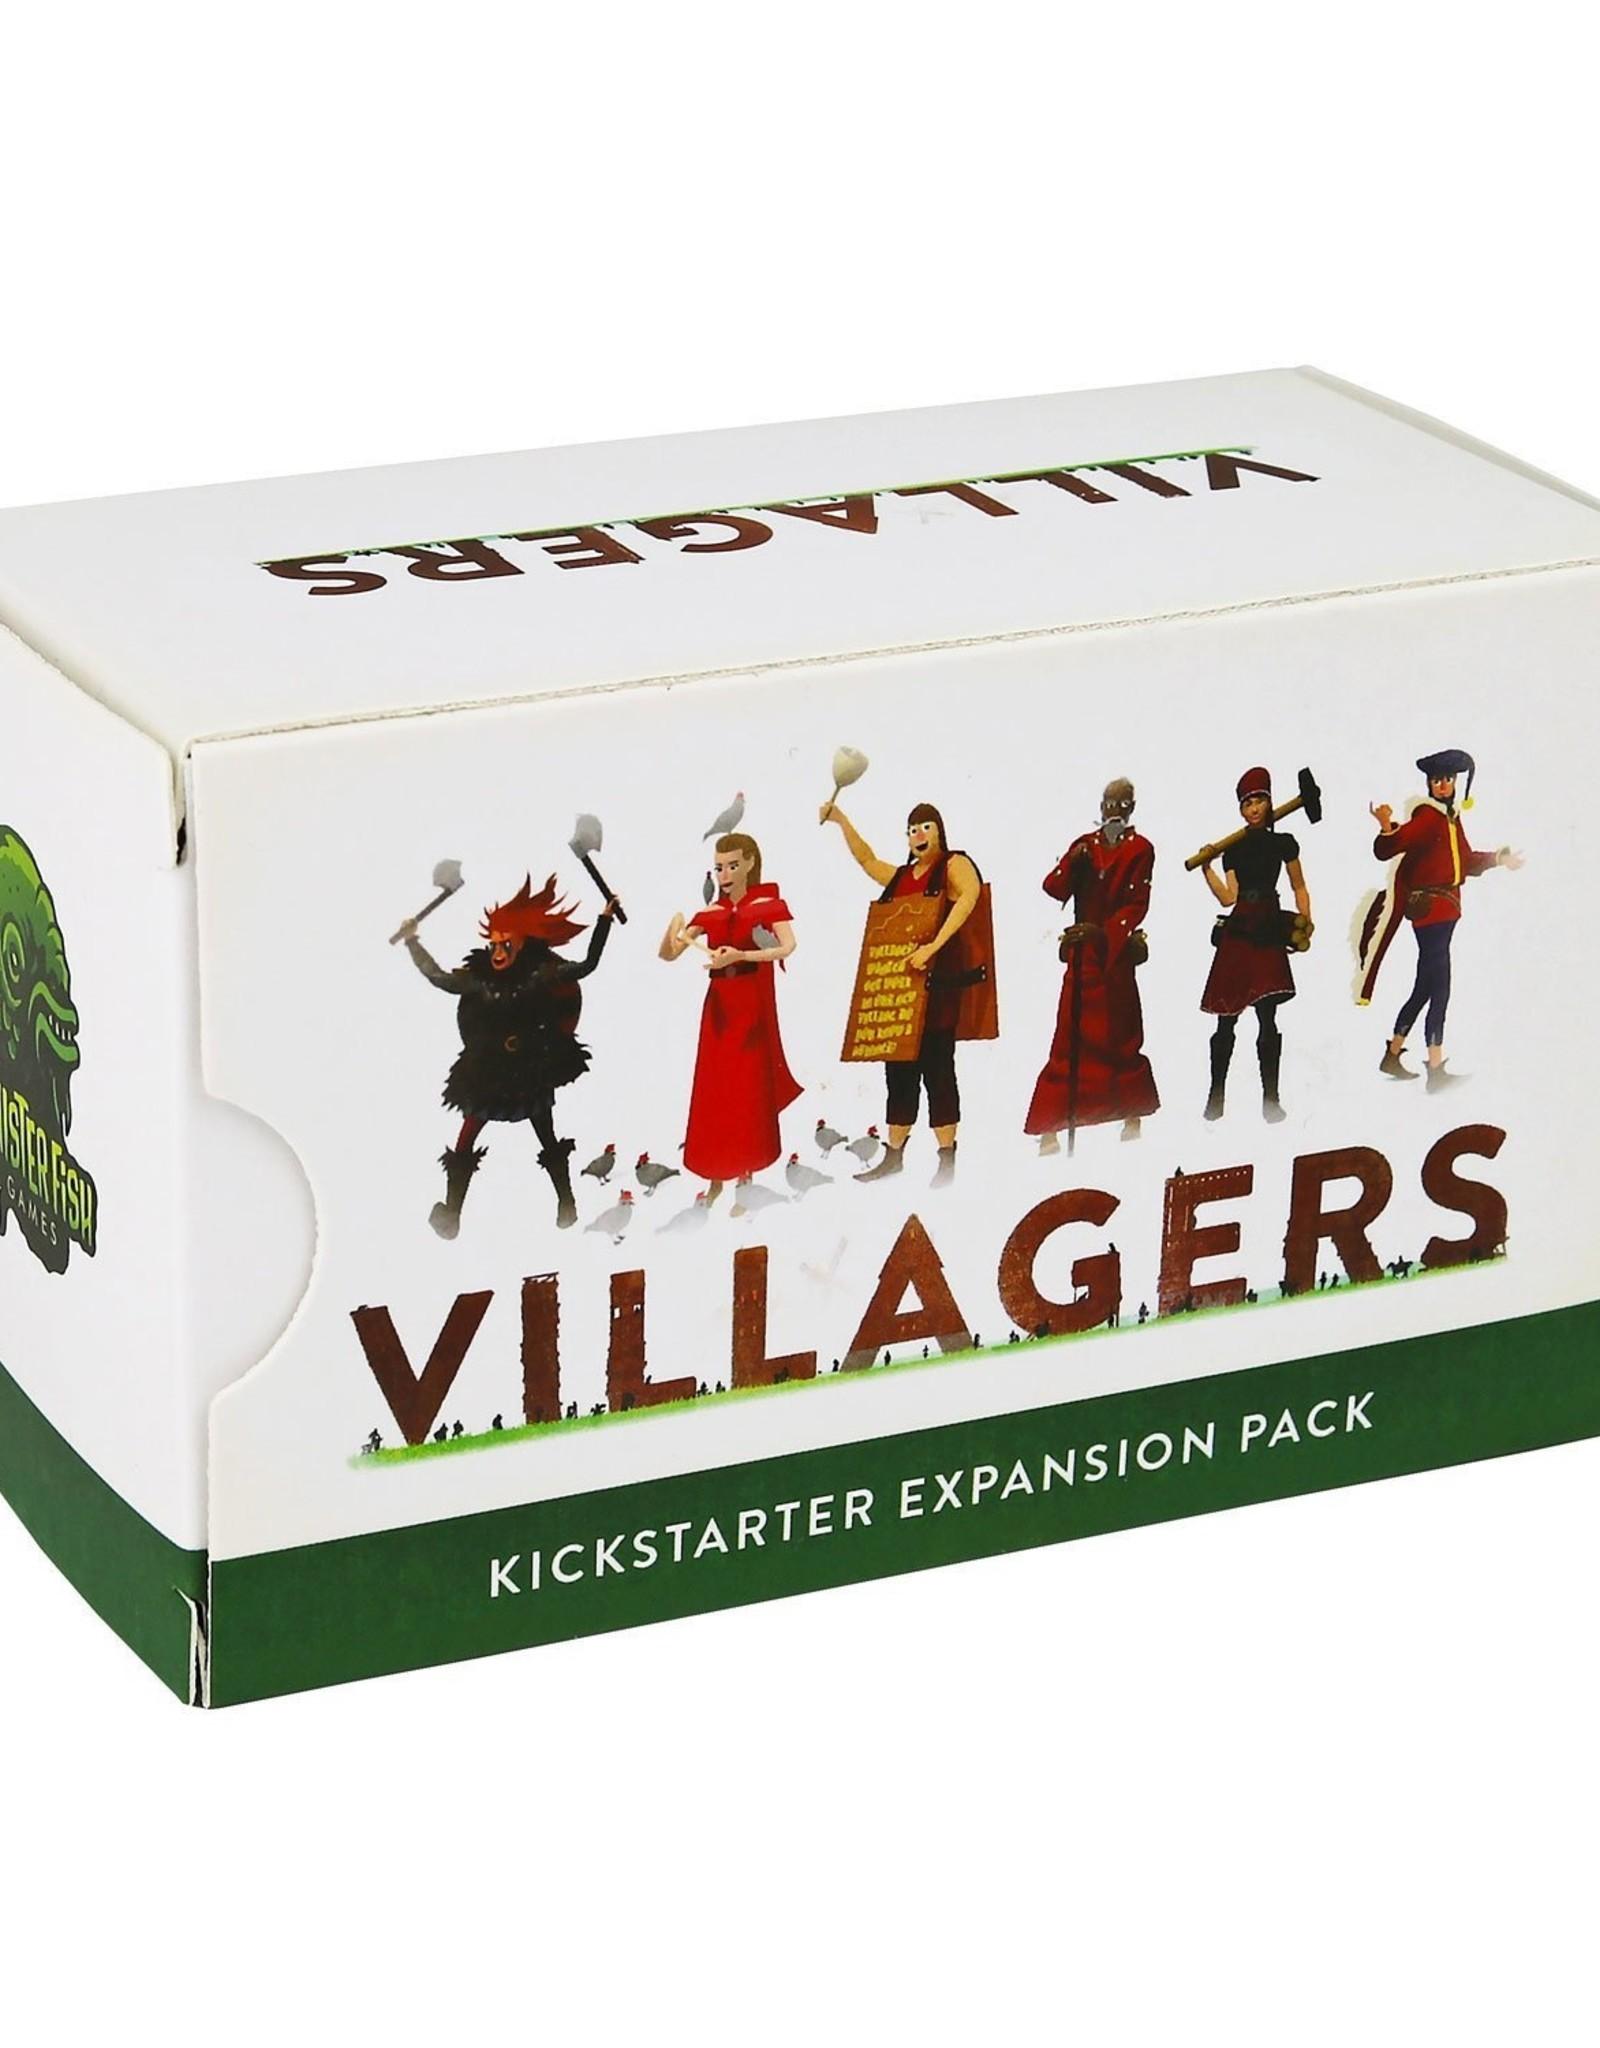 SINISTER FISH GAMES VILLAGERS KICKSTARTER EXPANSION PACK